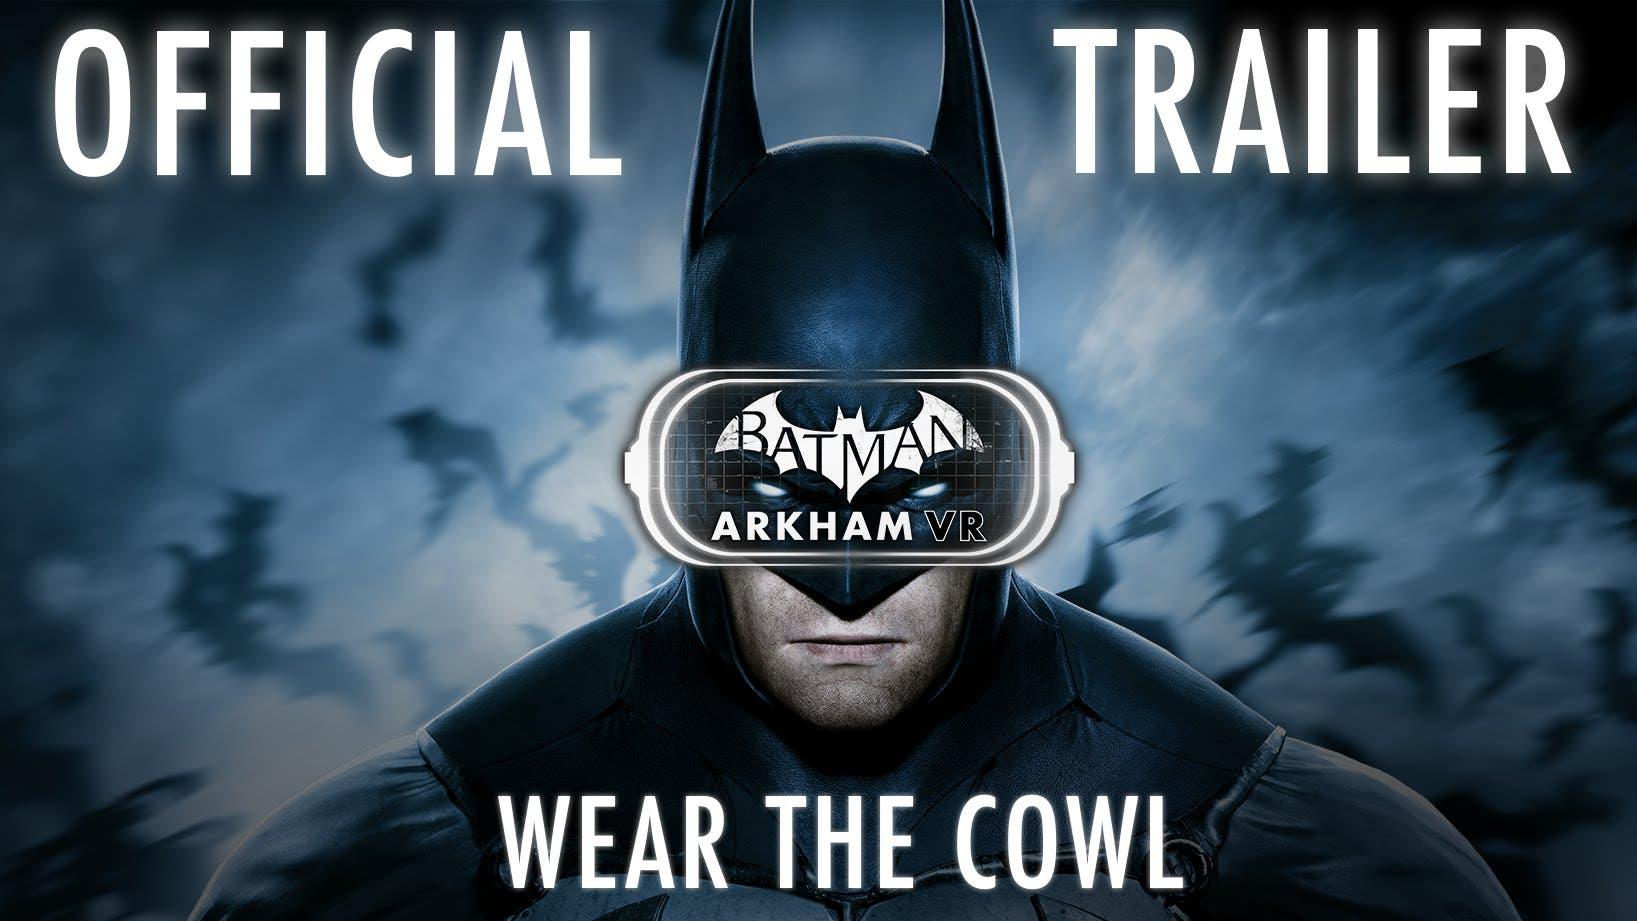 in batman arkham vr you get to w